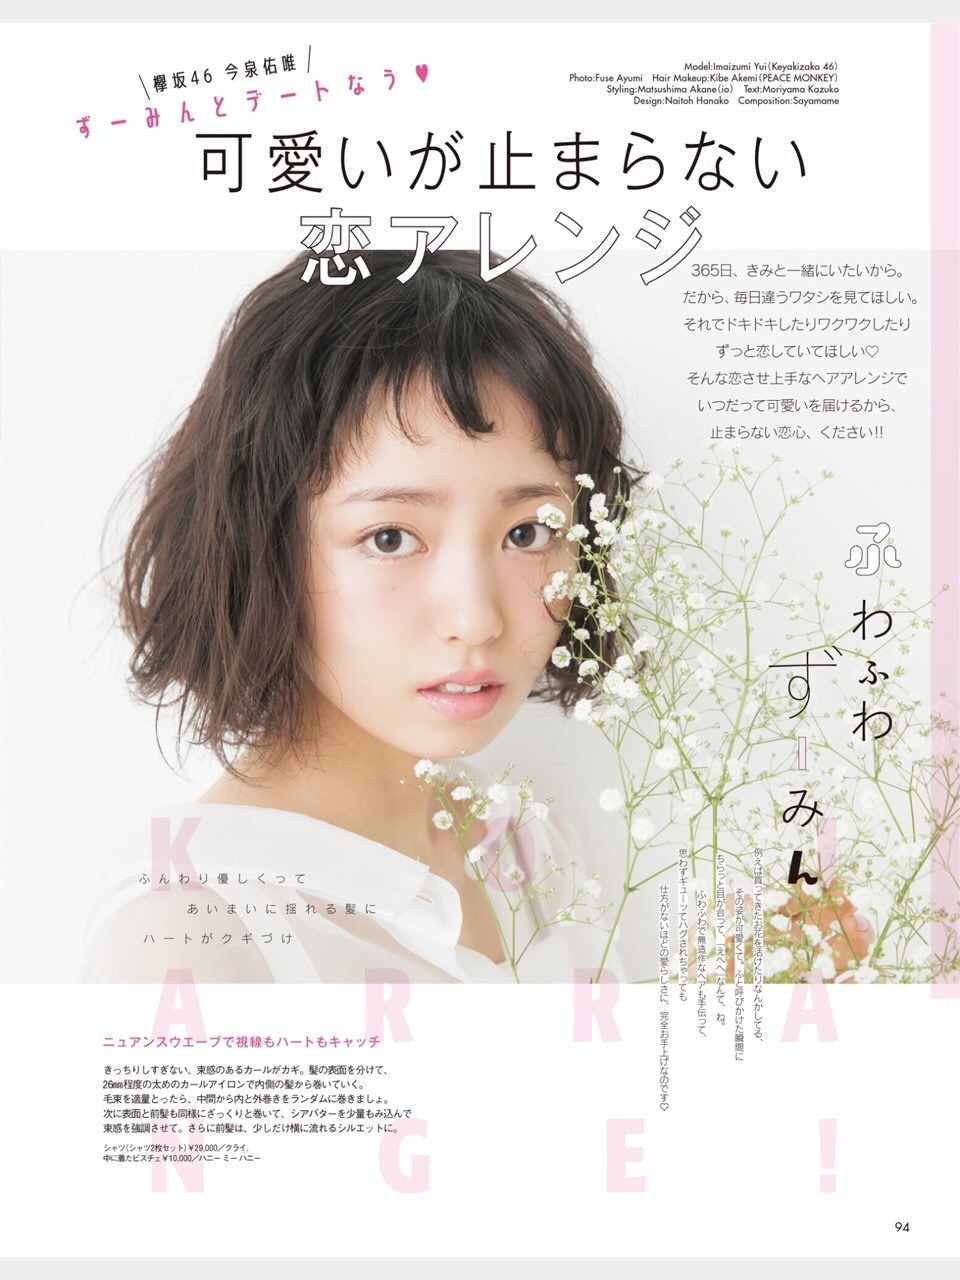 Imaizumi Yui 今泉佑唯, AR Magazine 2018.02